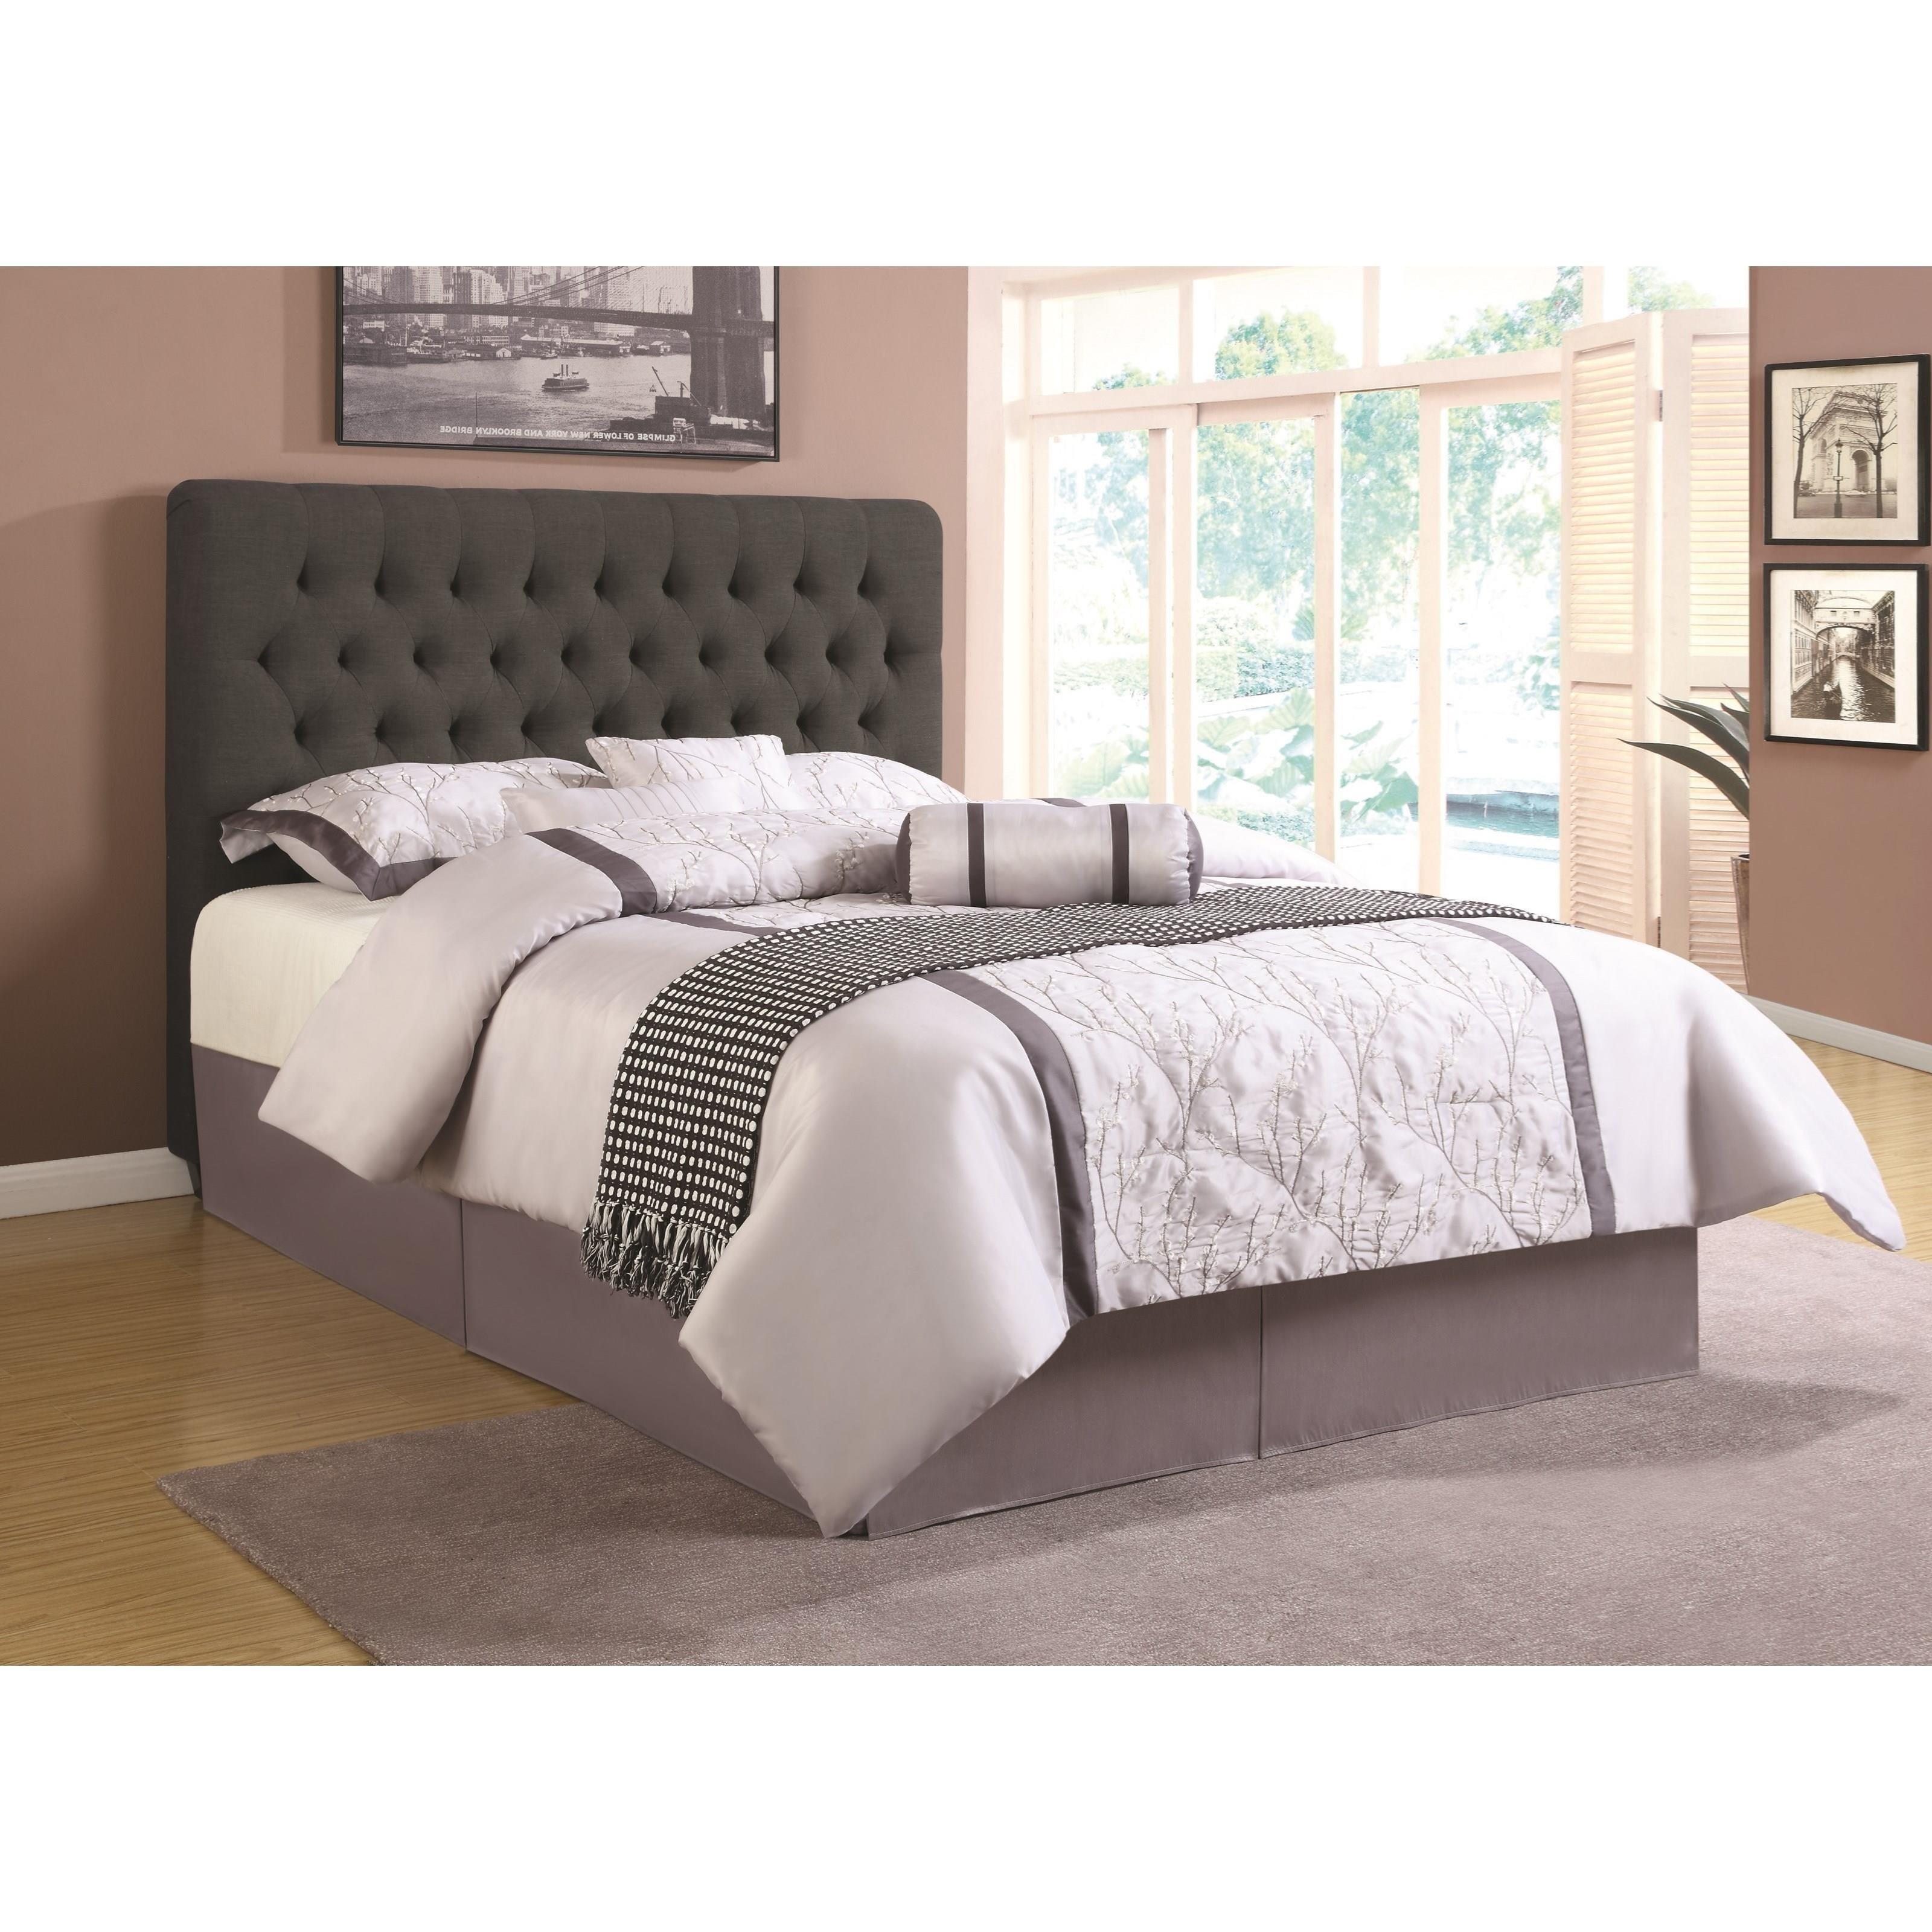 Coaster upholstered beds 300529kwb1 california king for California king headboard